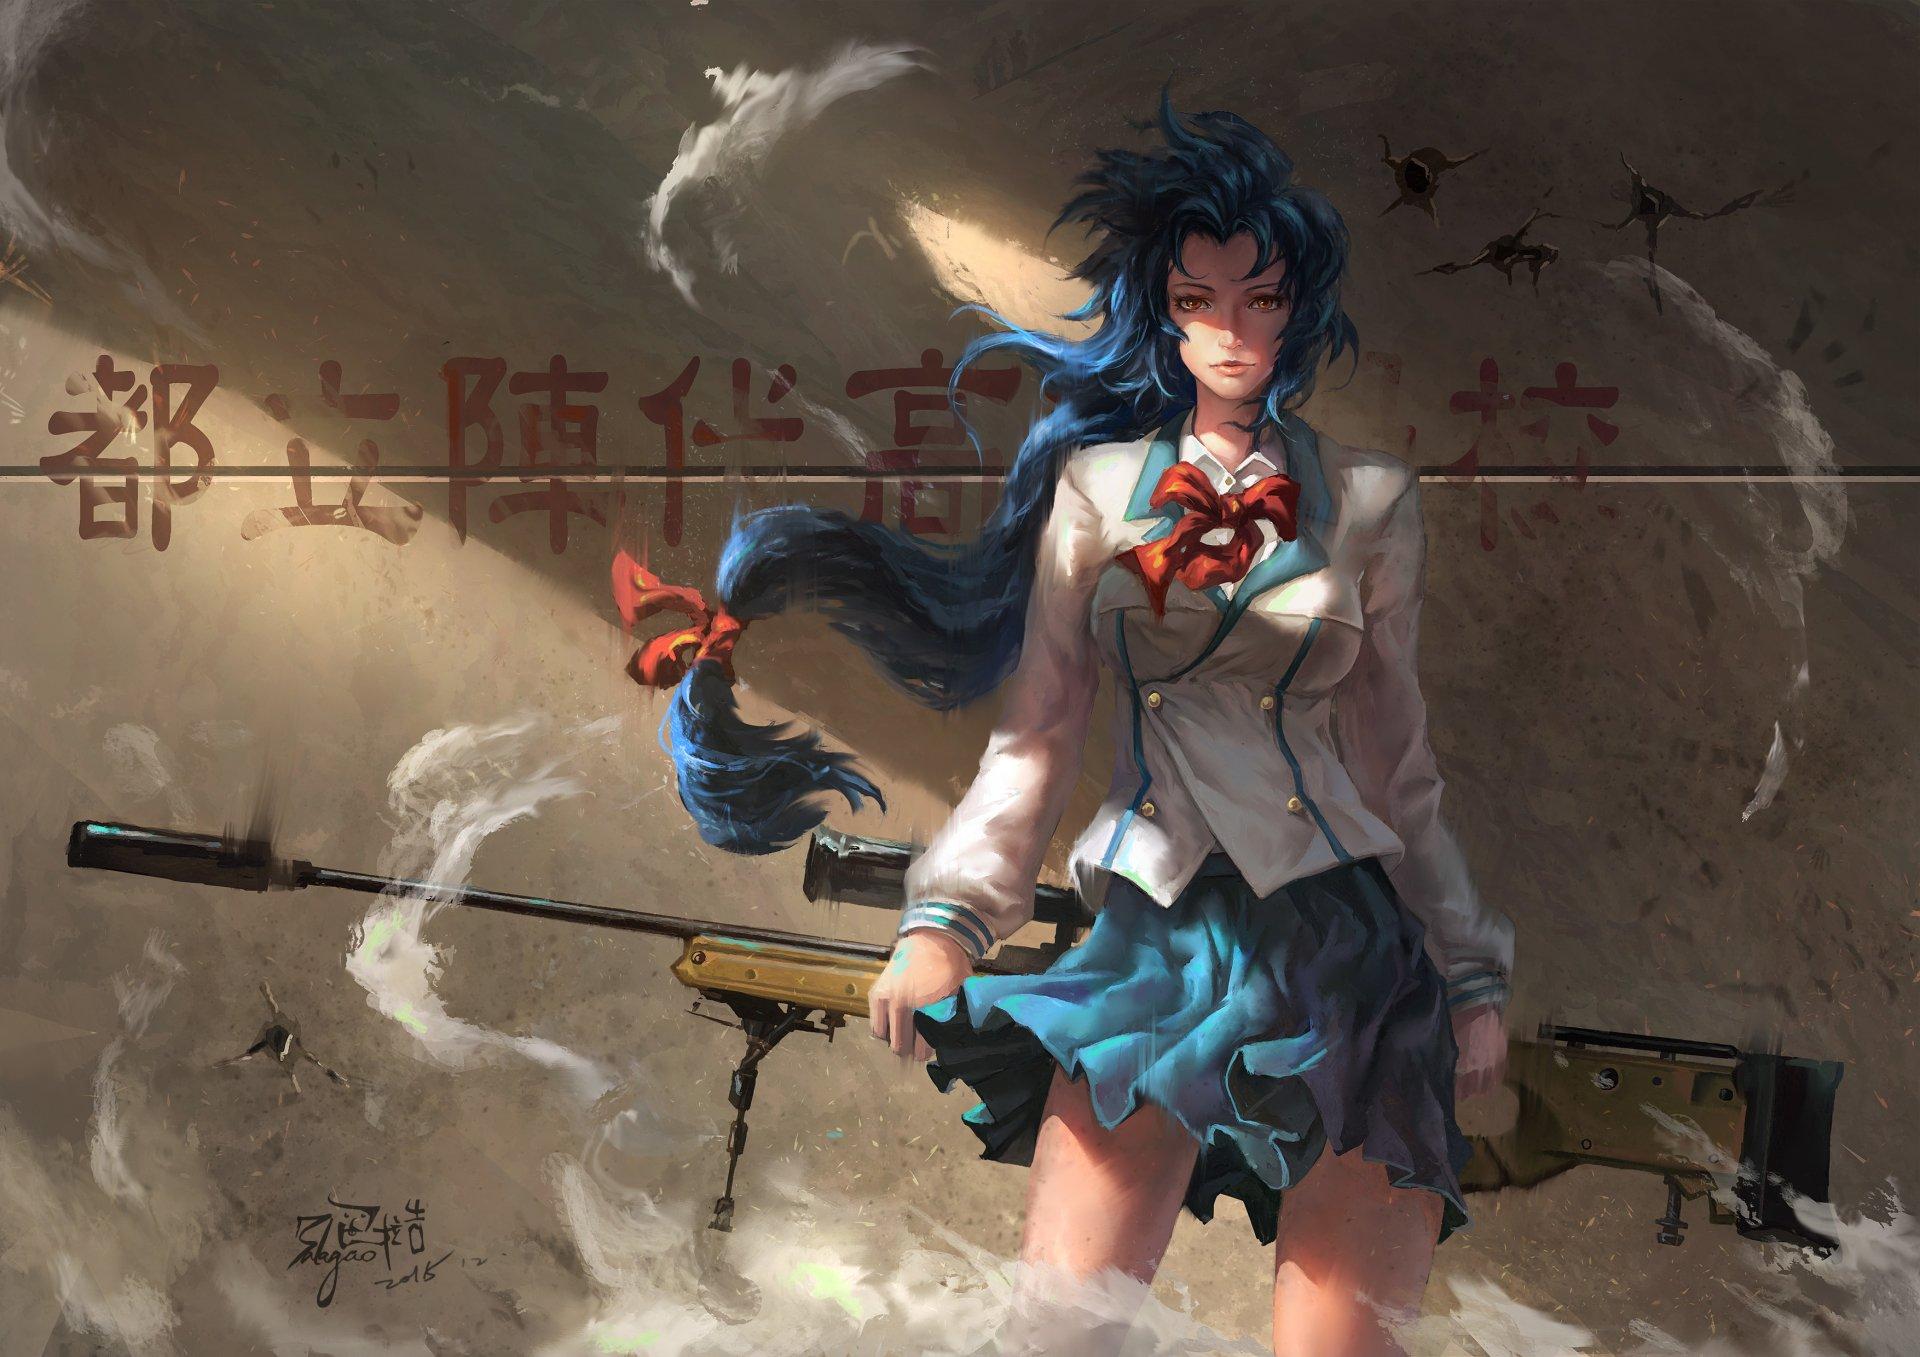 Anime - Full Metal Panic!  Girl School Uniform Skirt Long Hair Red Eyes Blue Hair Sniper Rifle Weapon Wallpaper